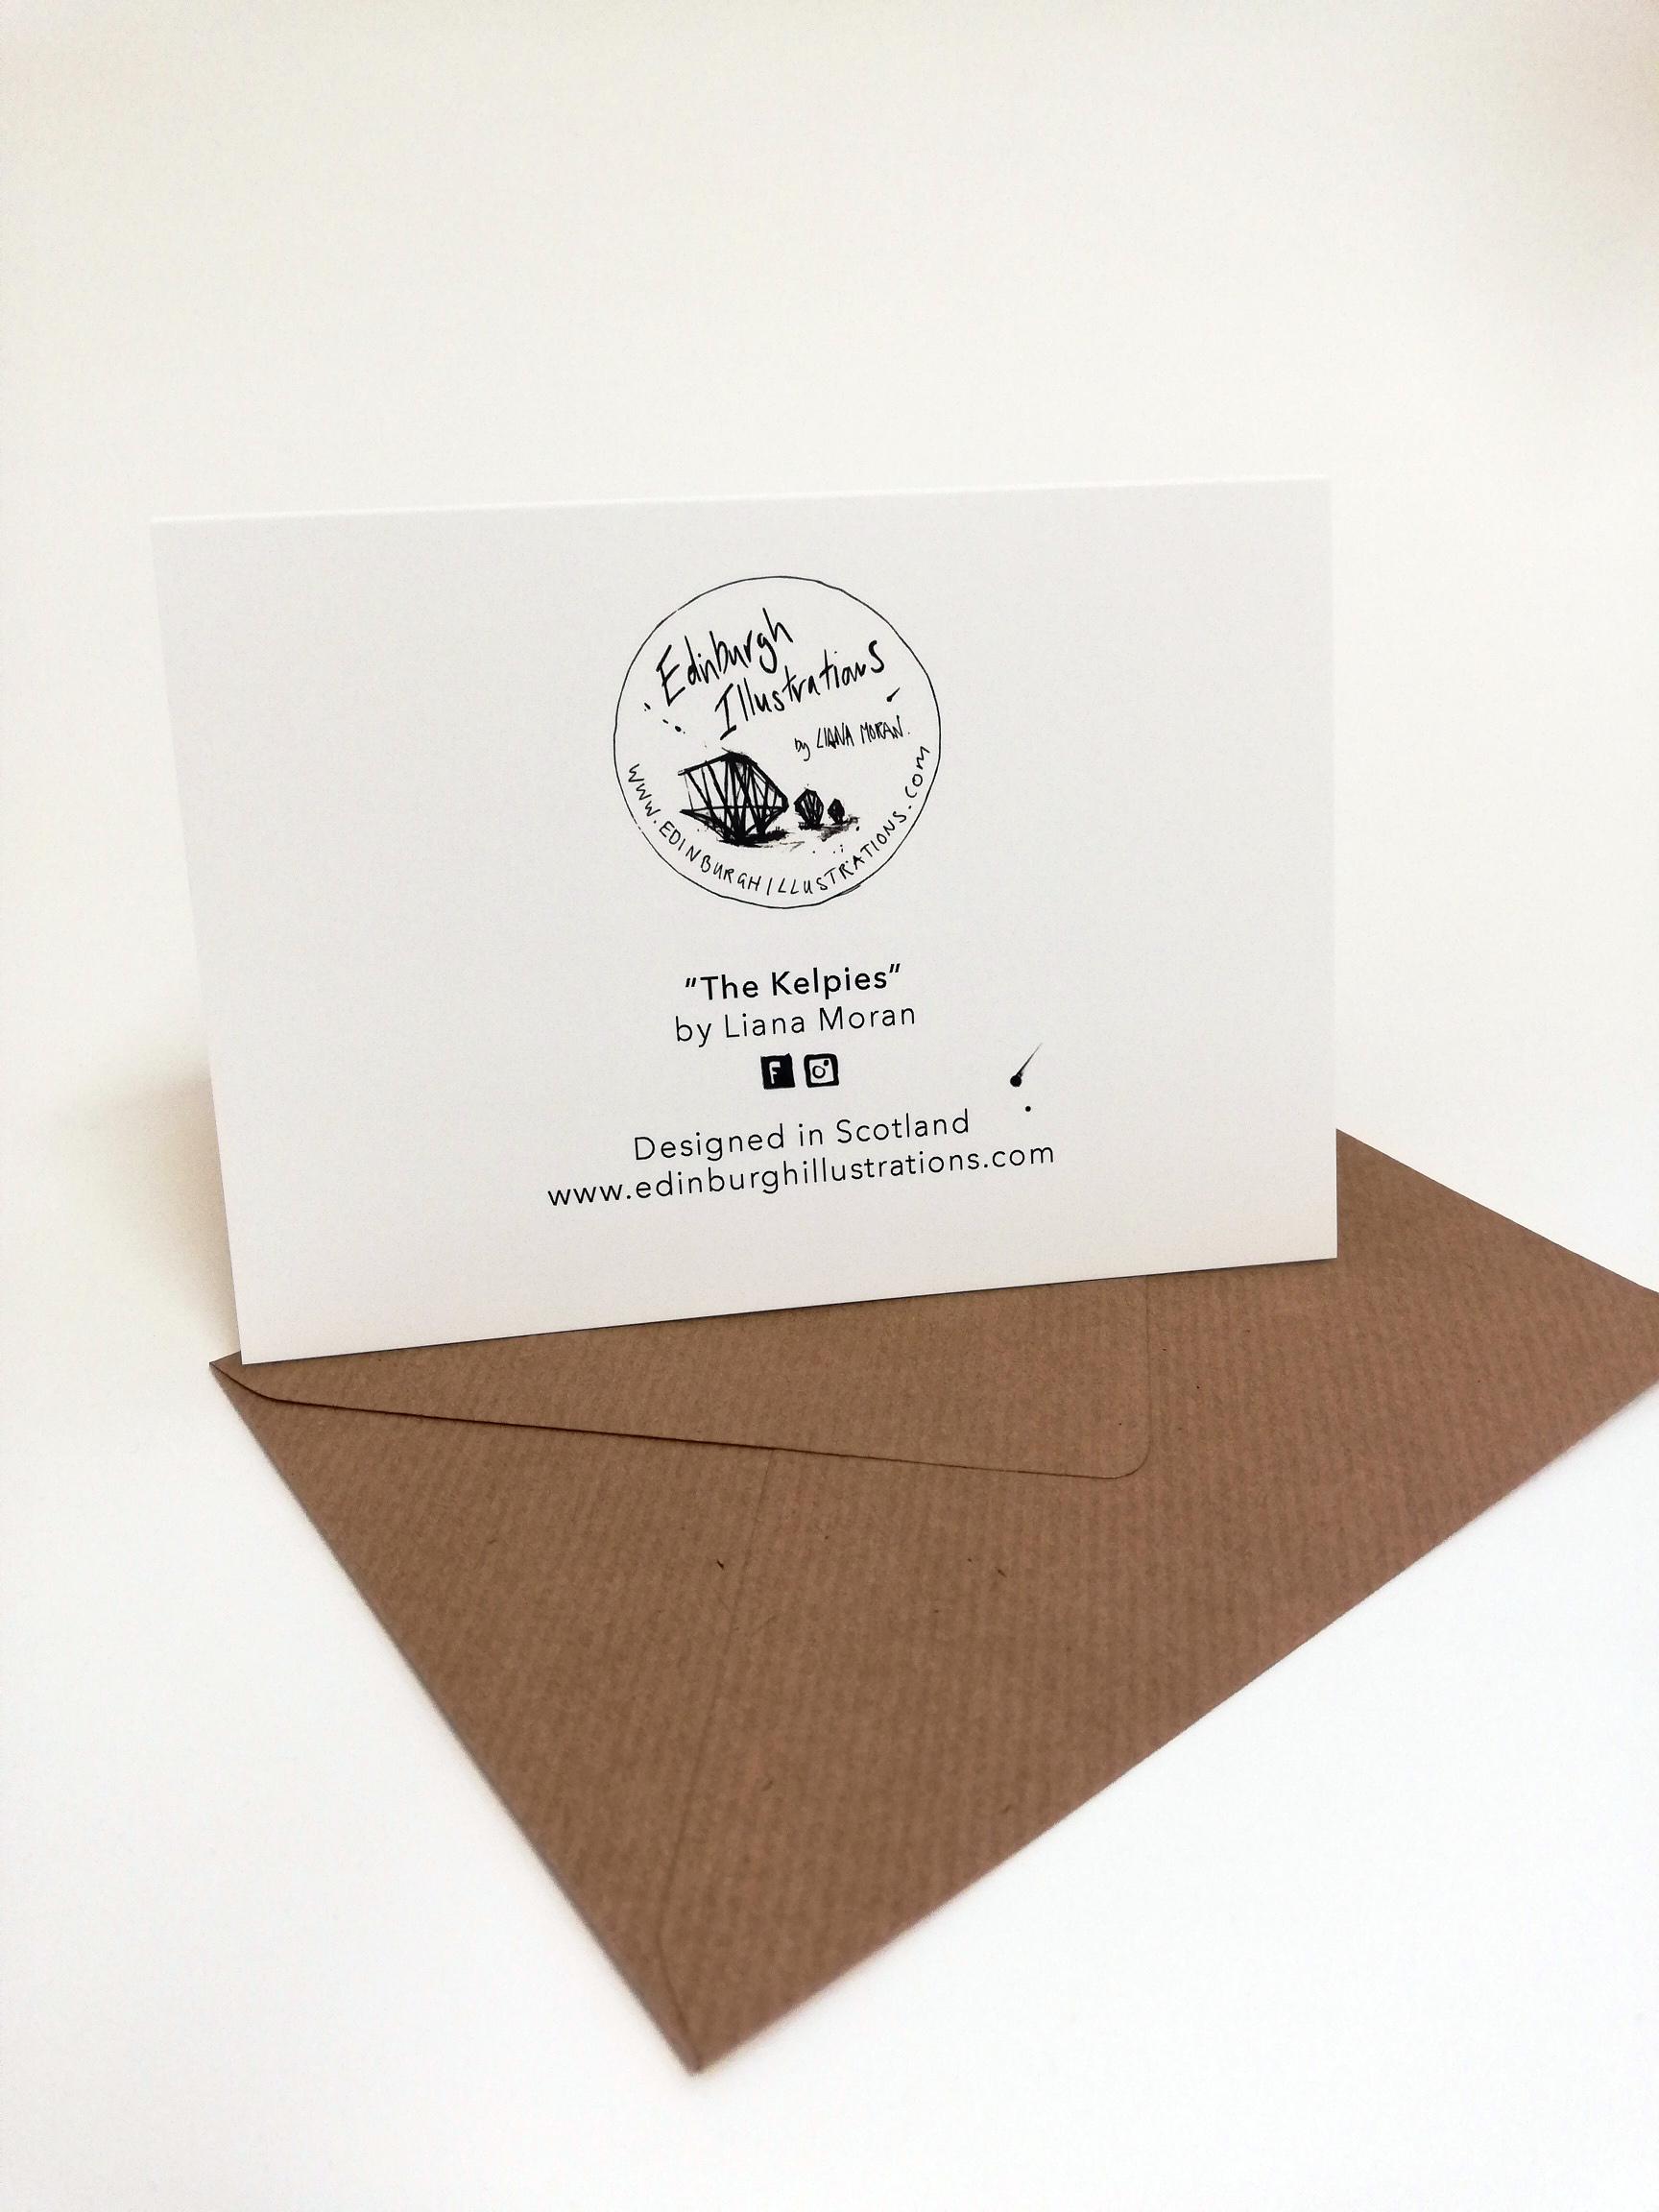 The Kelpies Christmas Card